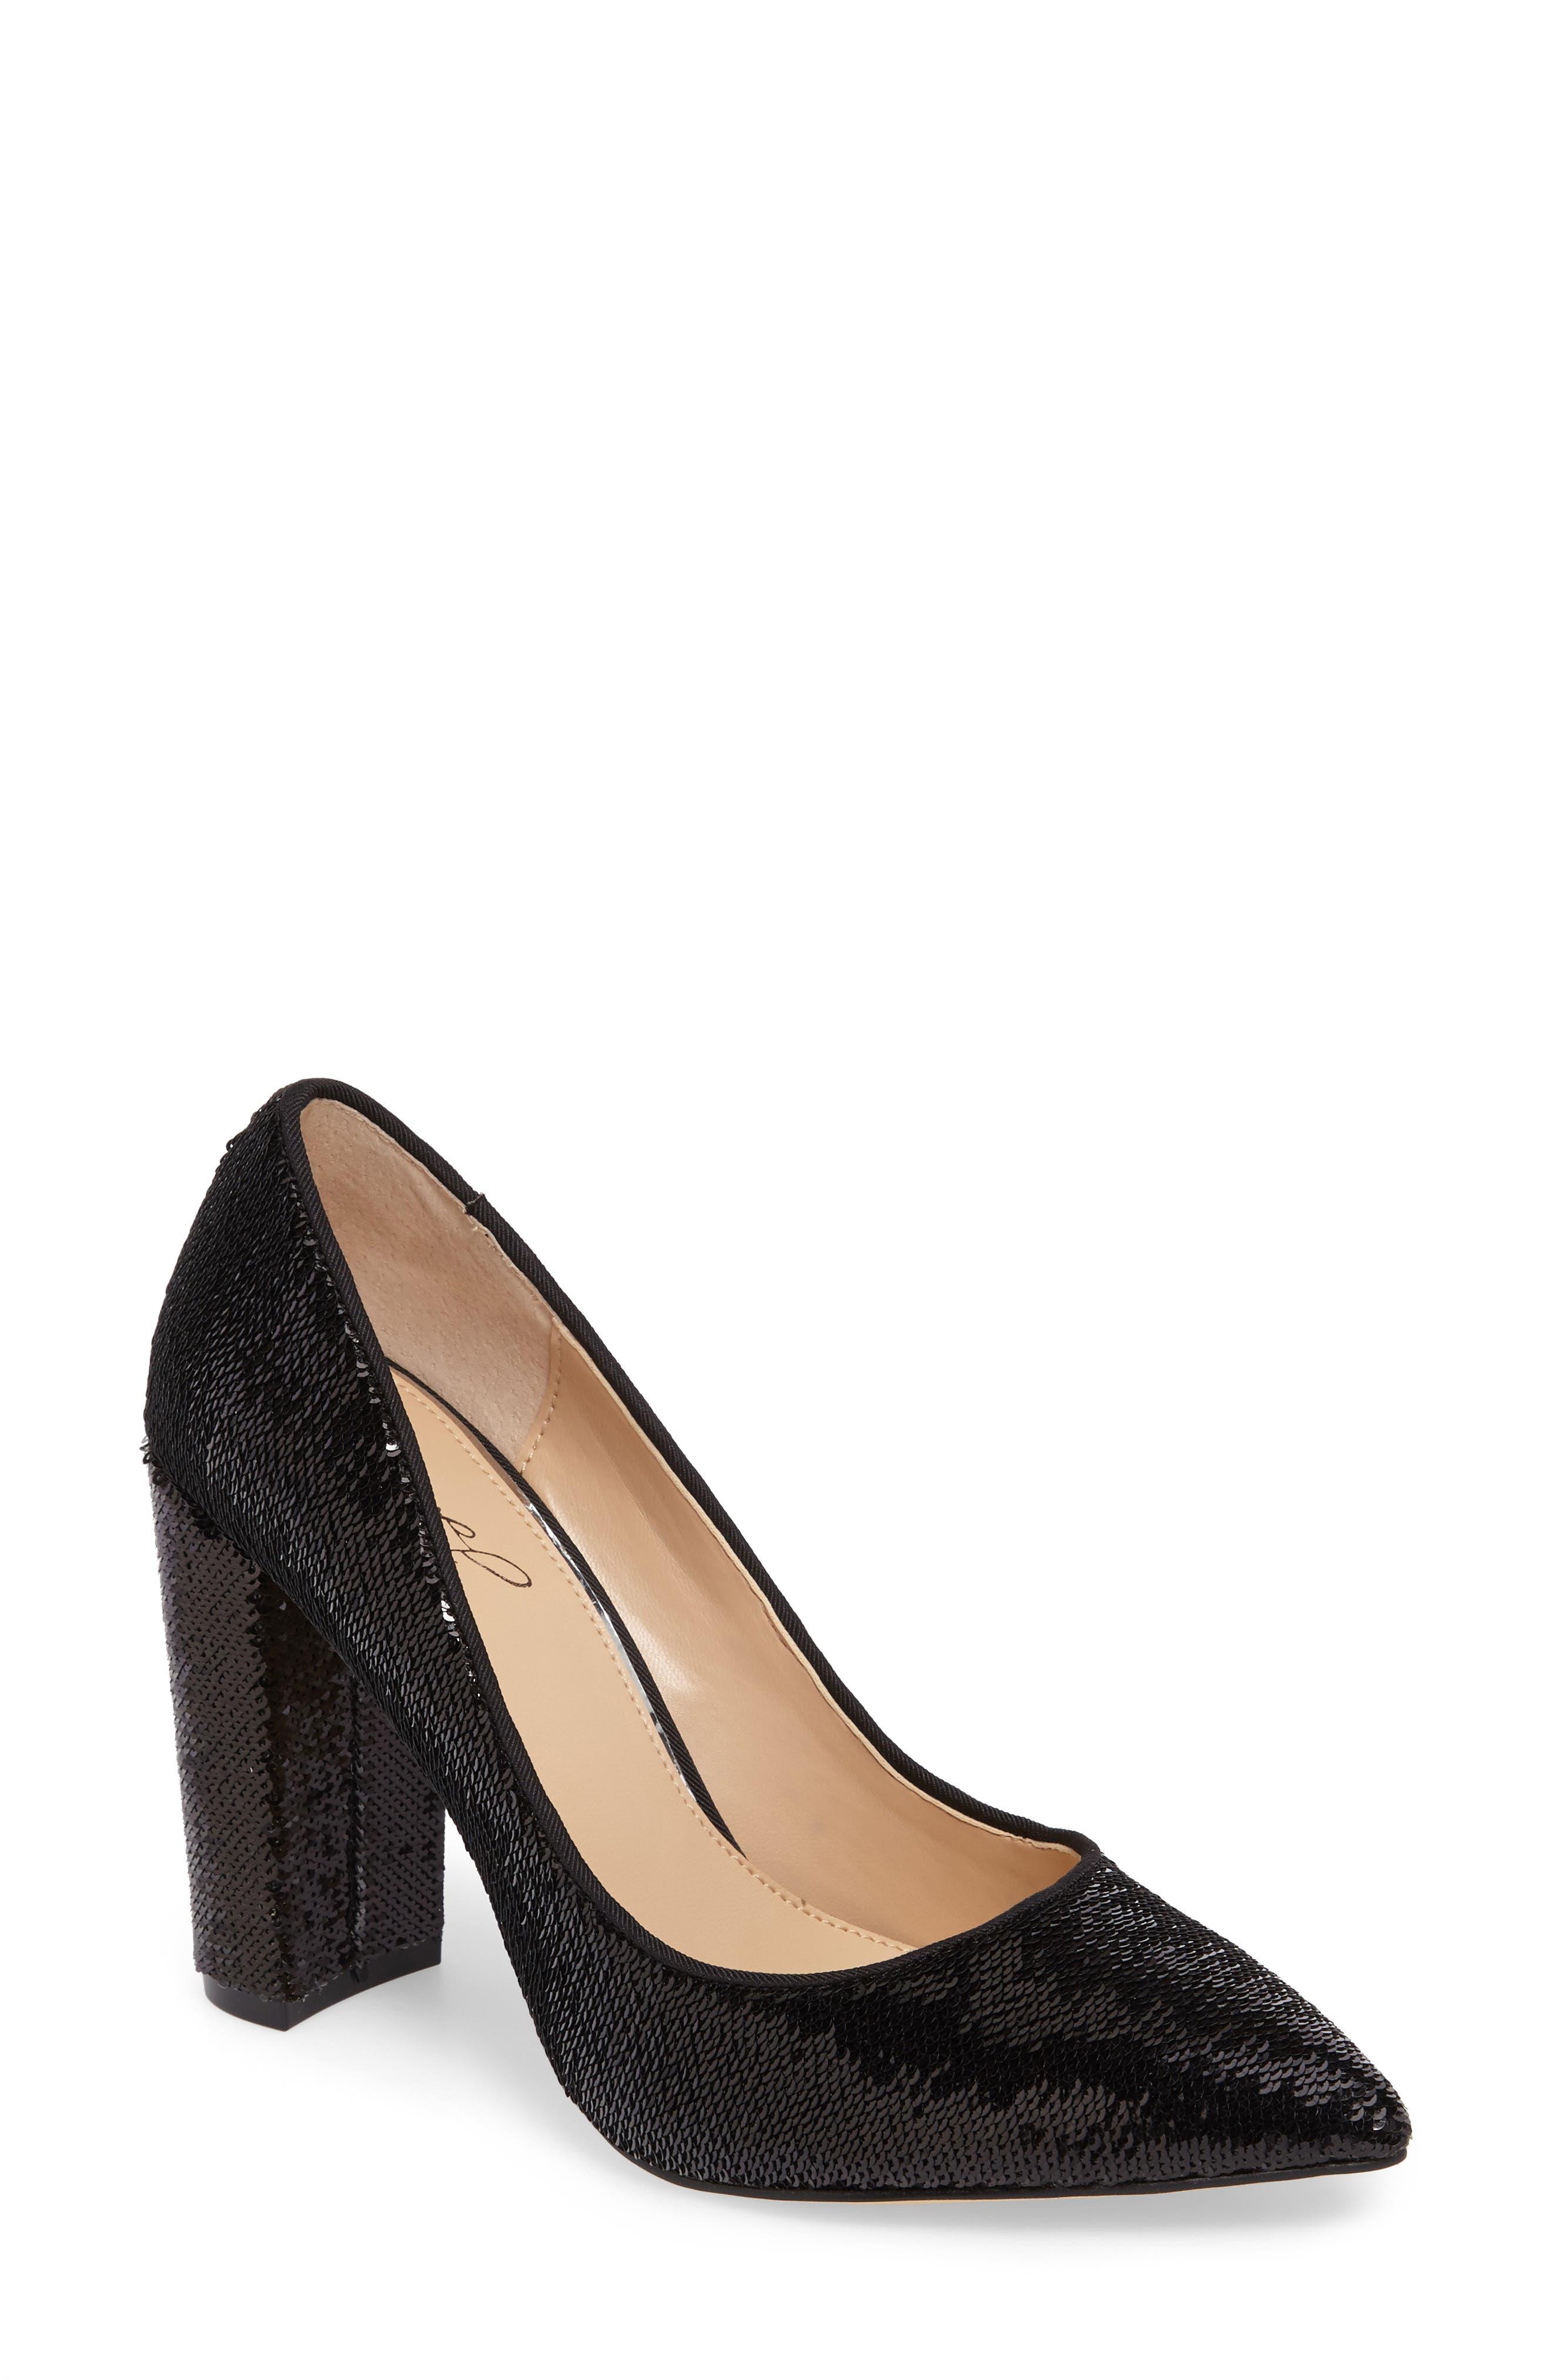 Alternate Image 1 Selected - Jewel Badgley Mischka Luxury Pointy Toe Pump (Women)